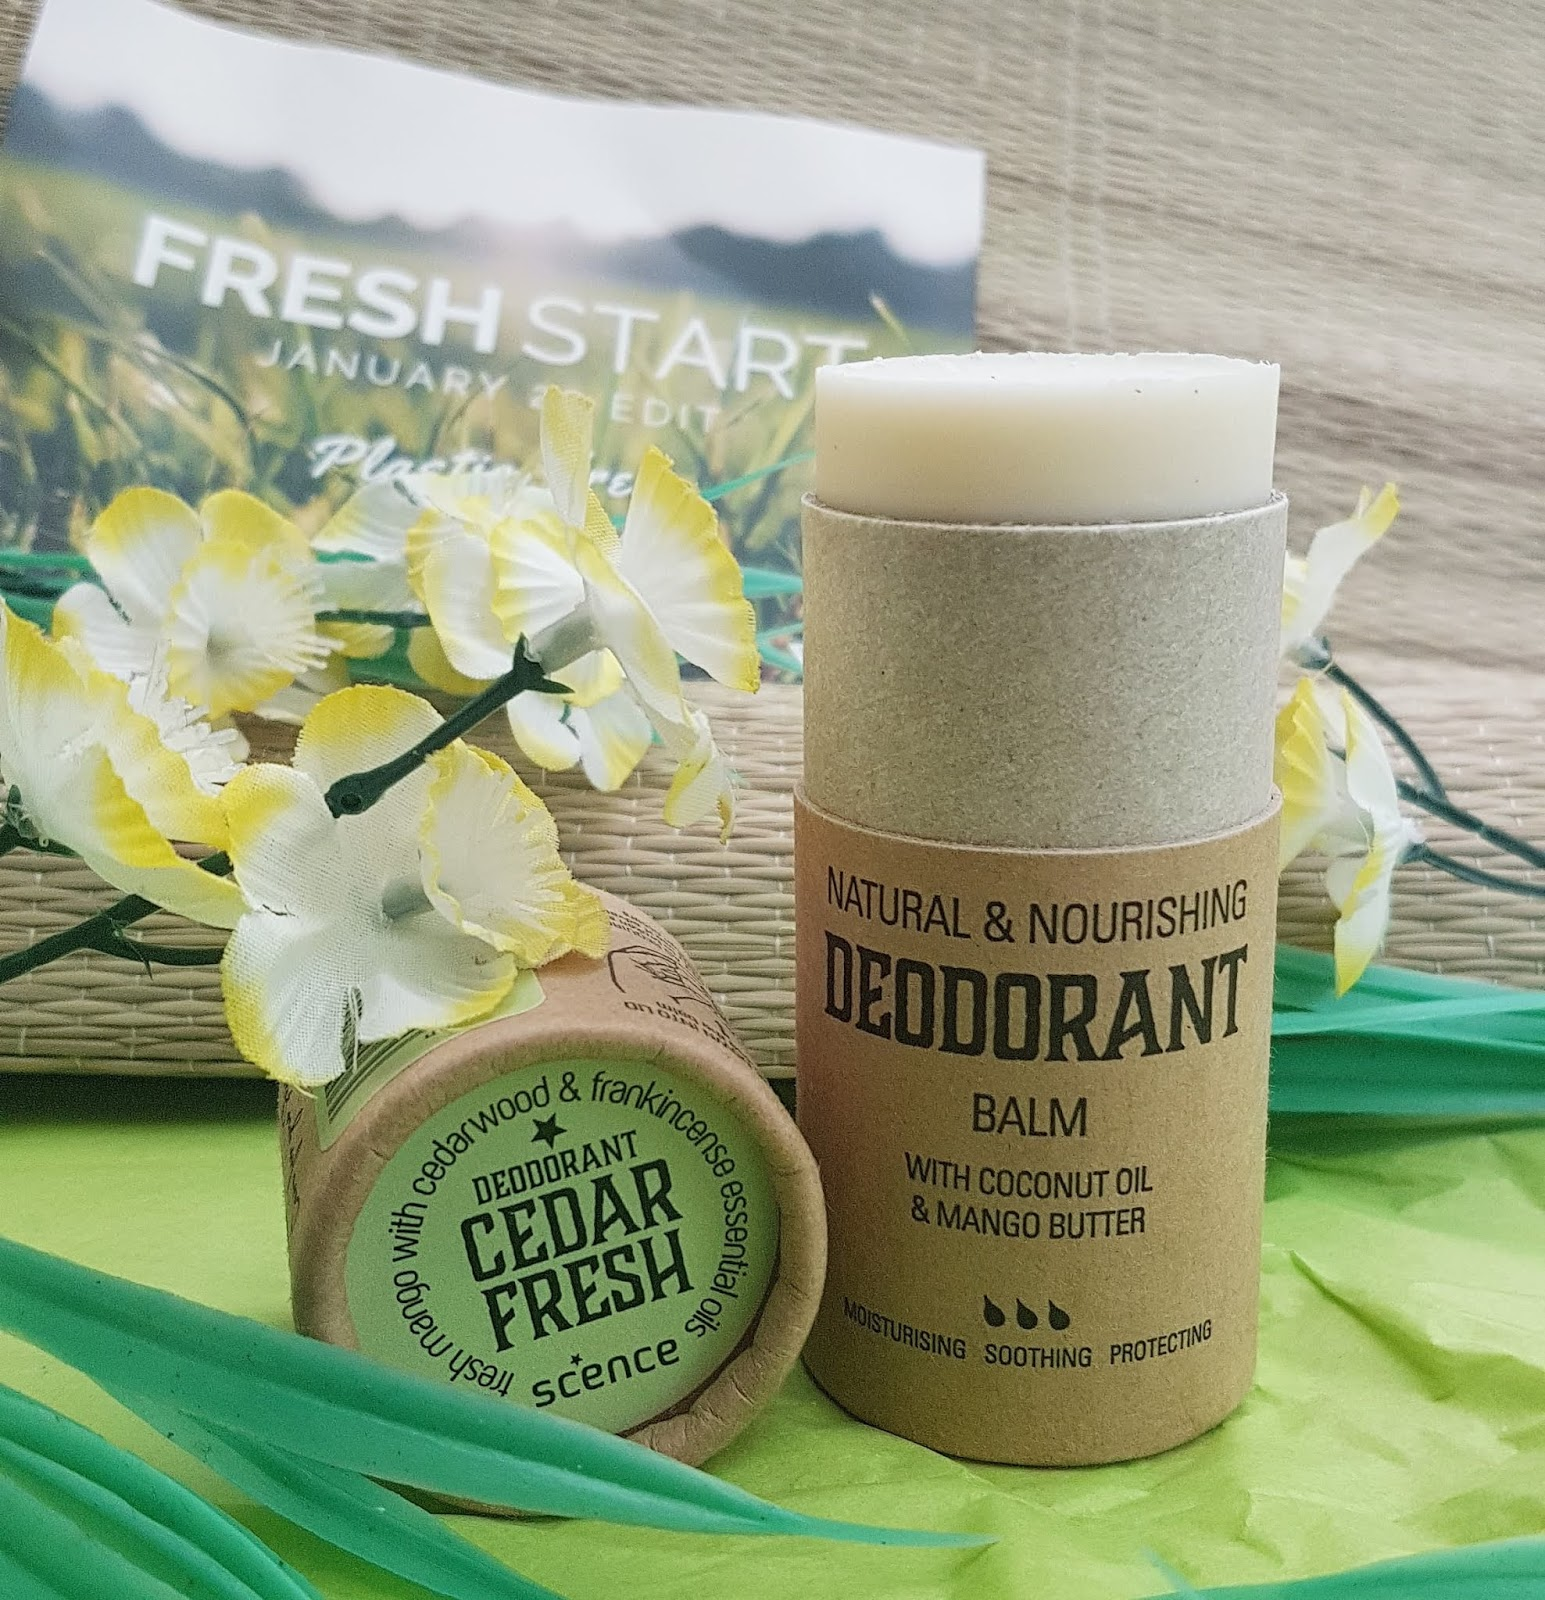 The Natural Beauty Box - Scence Cedar Fresh Deodorant Review